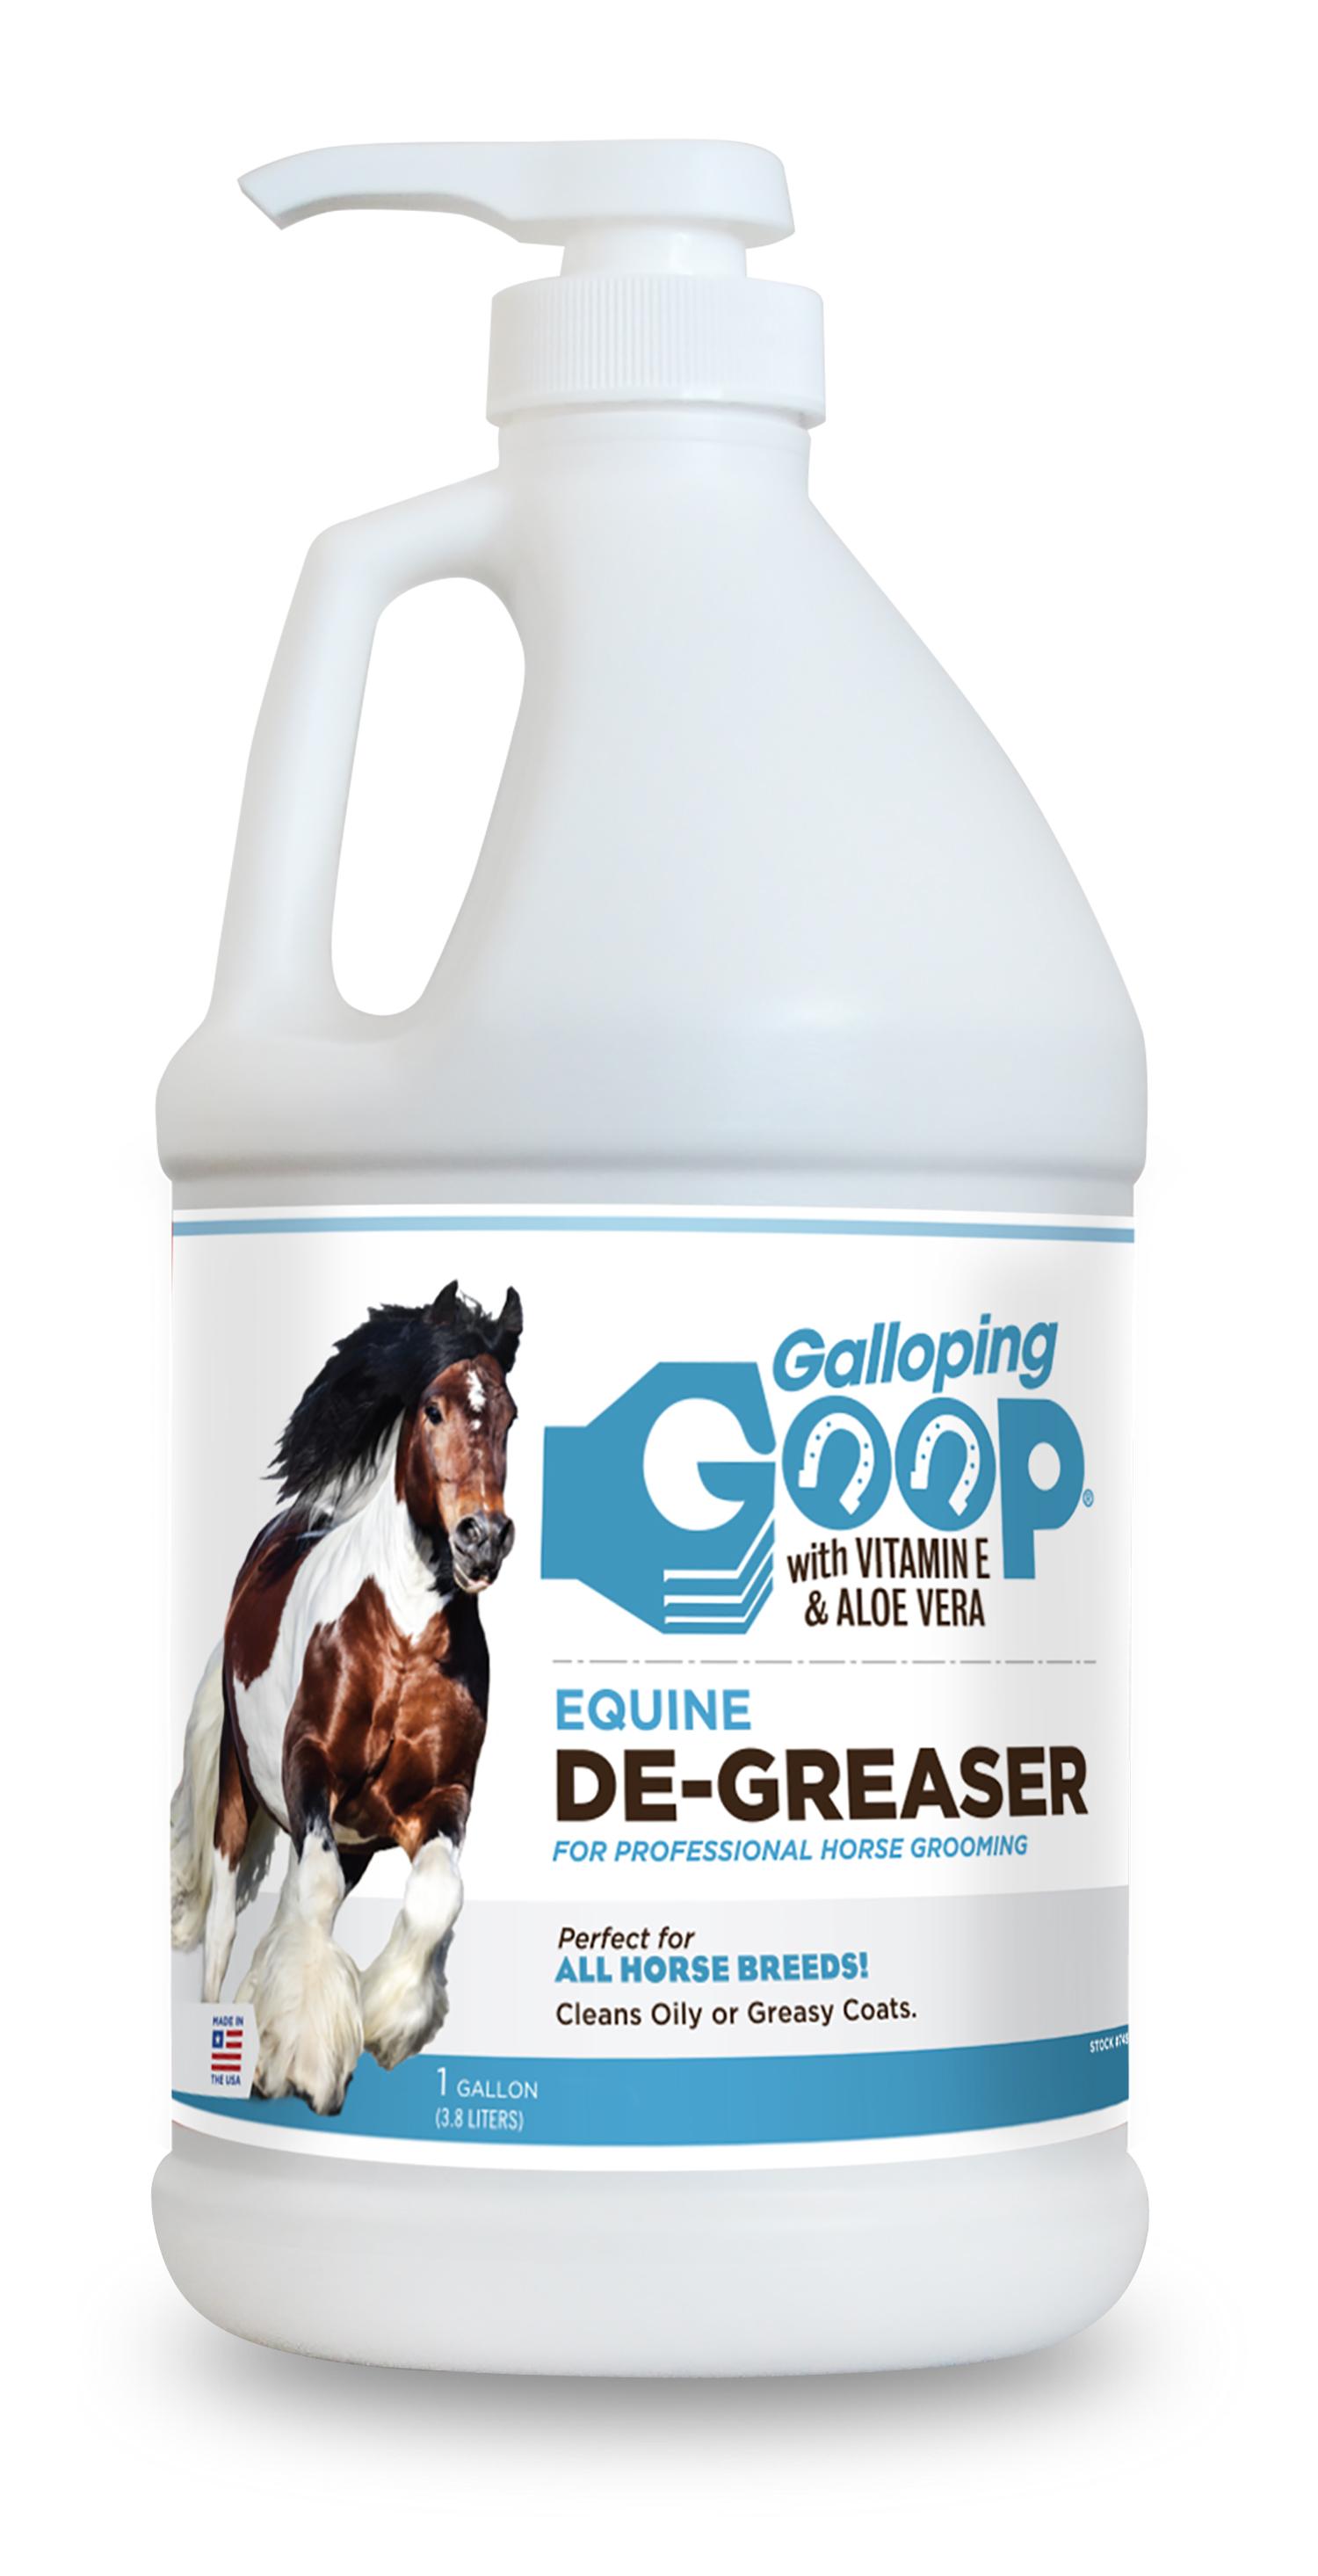 Moms-Goop-Galloping-745-Degreaser1Gallon.jpg